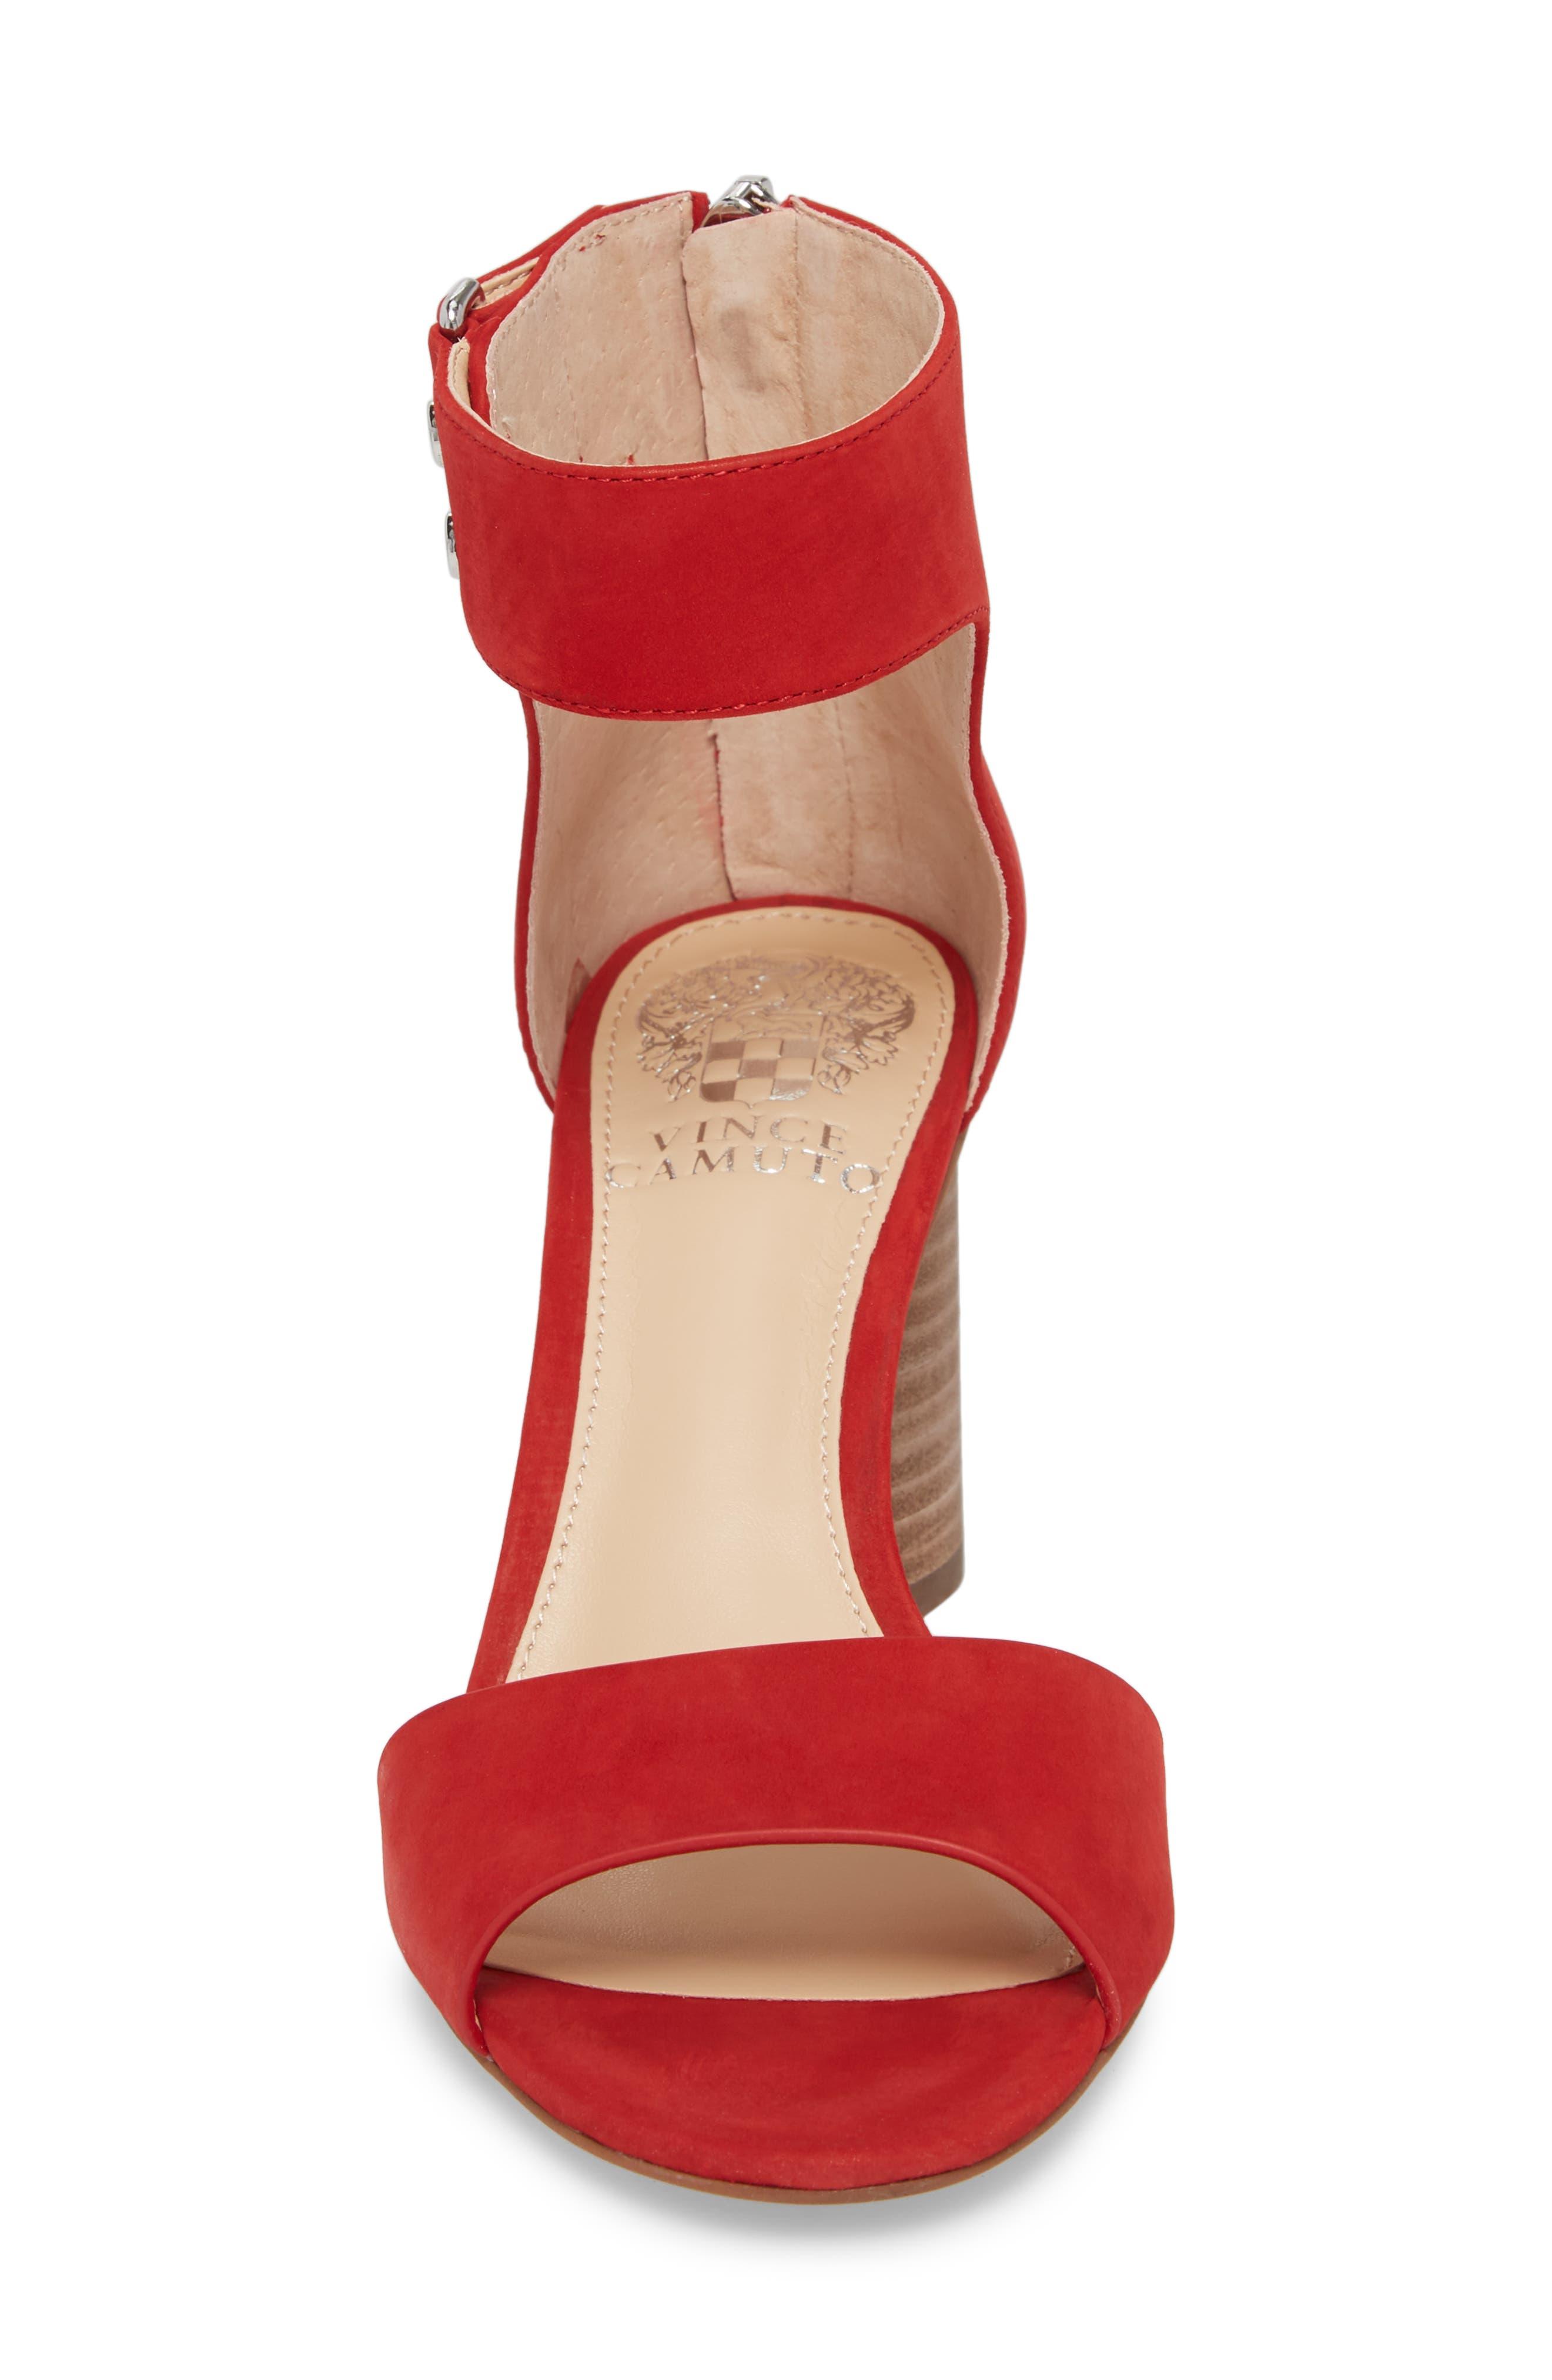 Jannali Ankle Strap Sandal,                             Alternate thumbnail 4, color,                             Cherry Red Leather